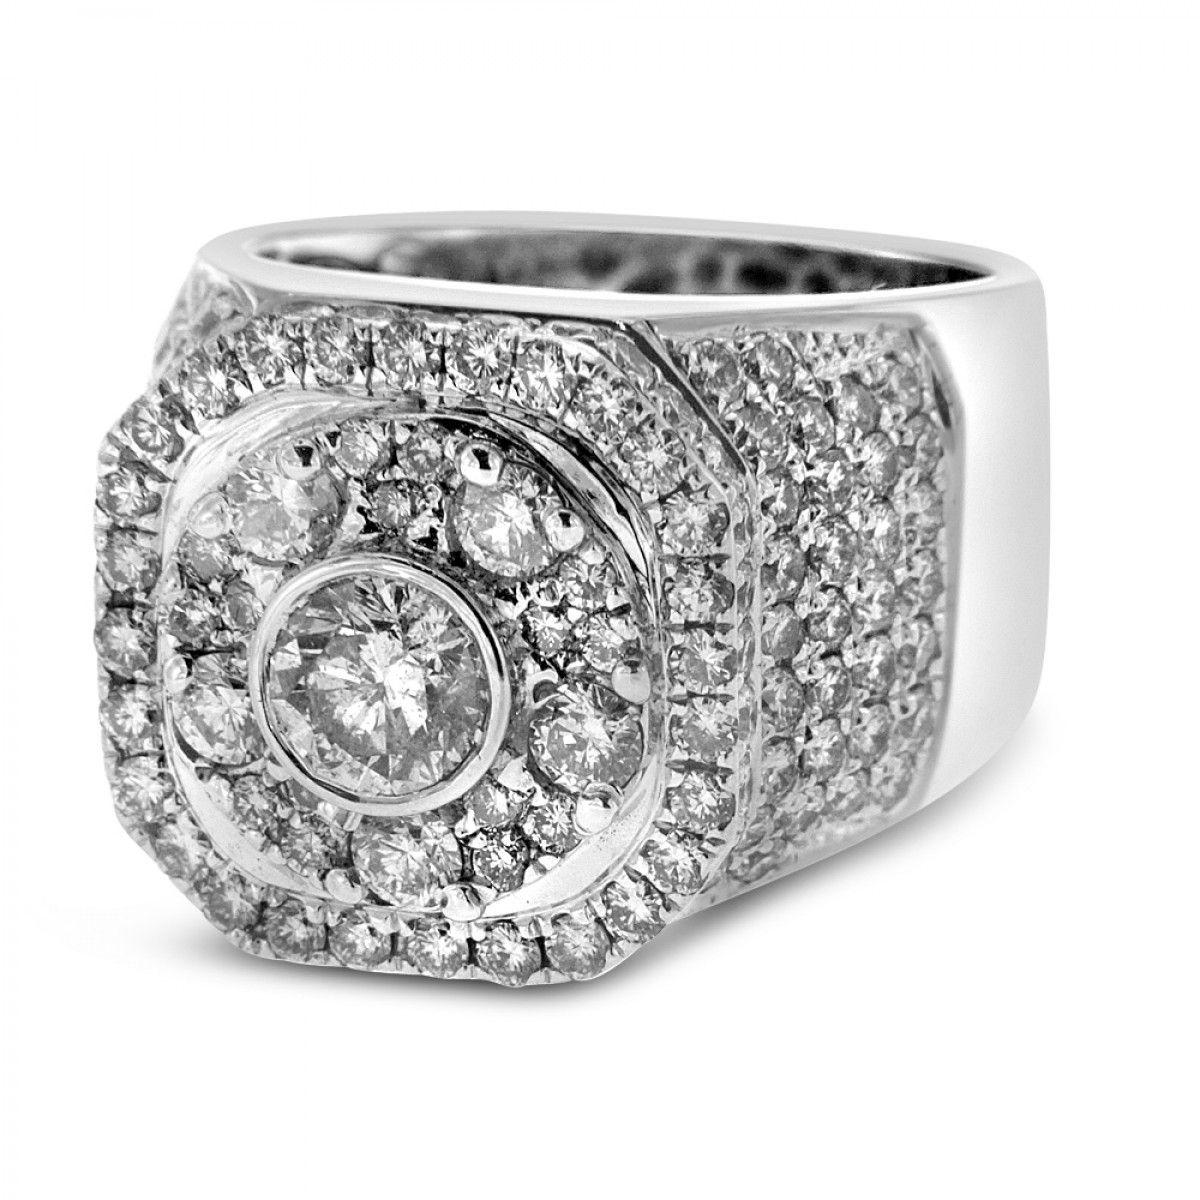 diamond pinky rings for men home men 39 s white gold. Black Bedroom Furniture Sets. Home Design Ideas